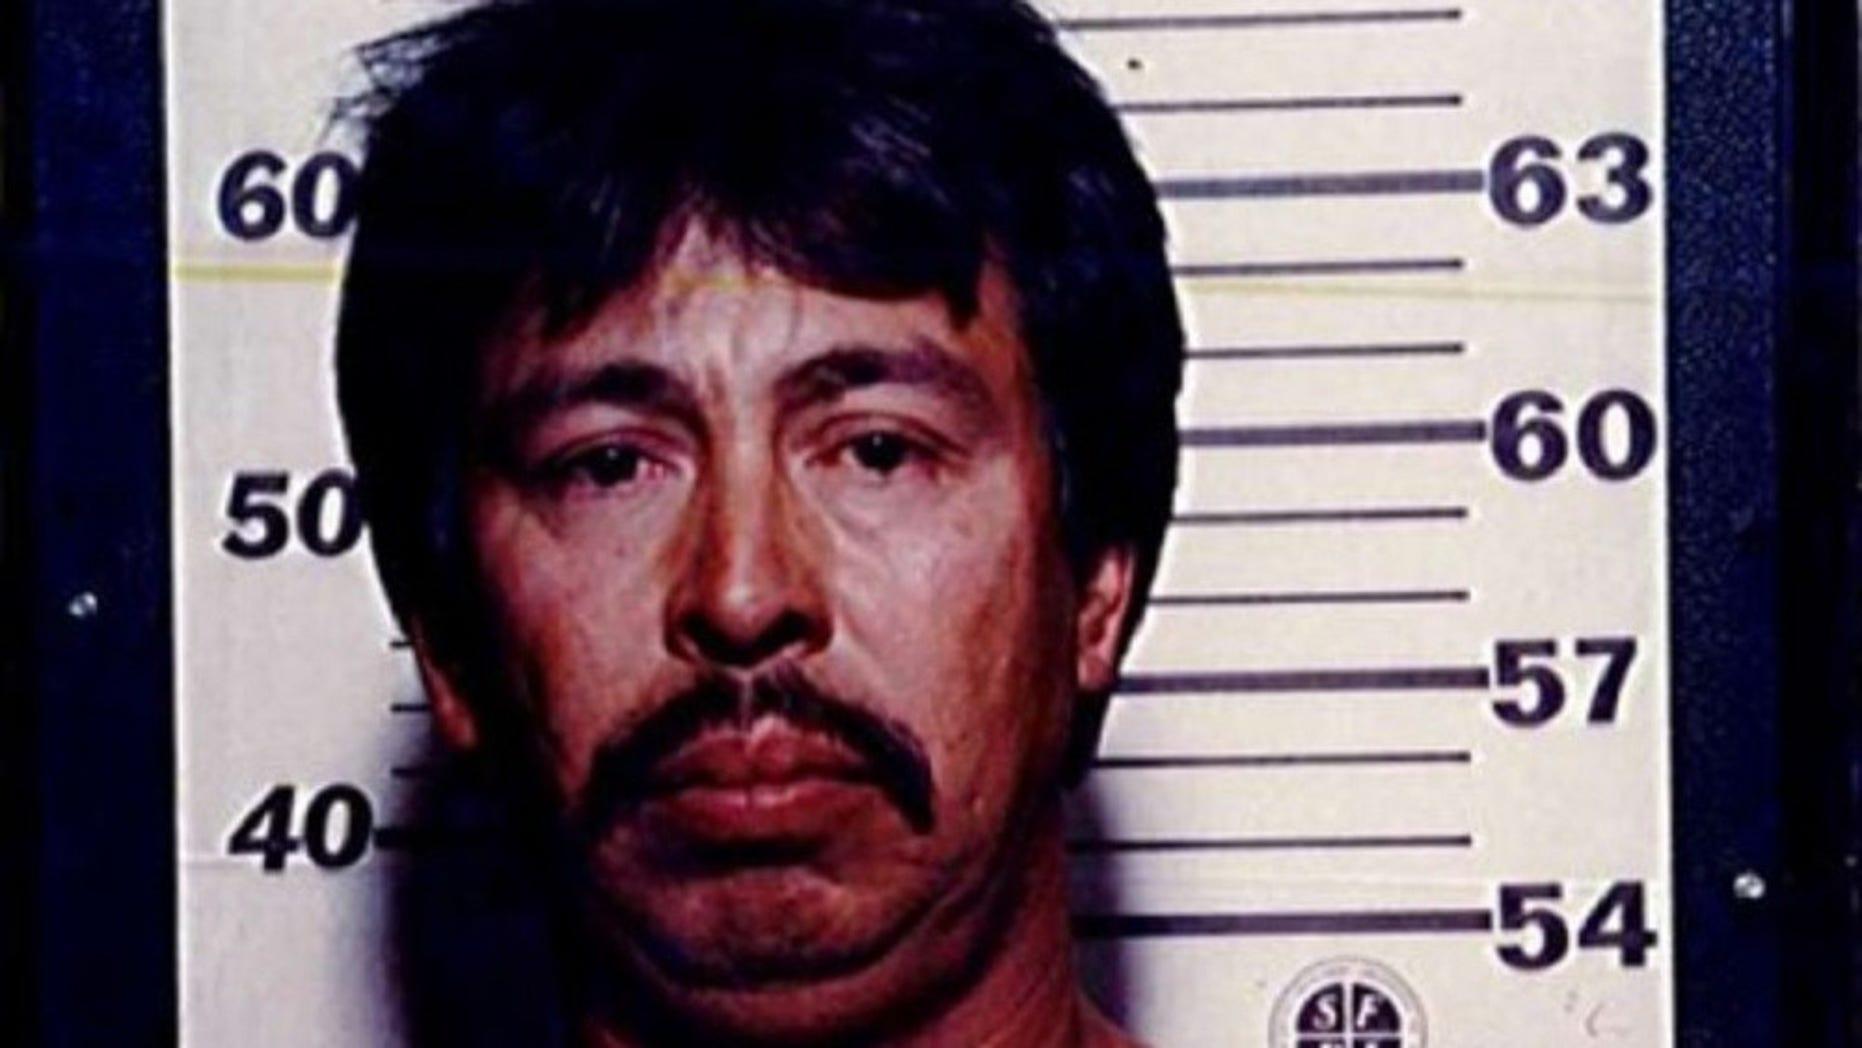 Enrique Salazar Ortiz, 63, of Elmendorf,Texas, has been sentenced to 30 months in prison, authorities say.(Bexar County Sheriff's Office)